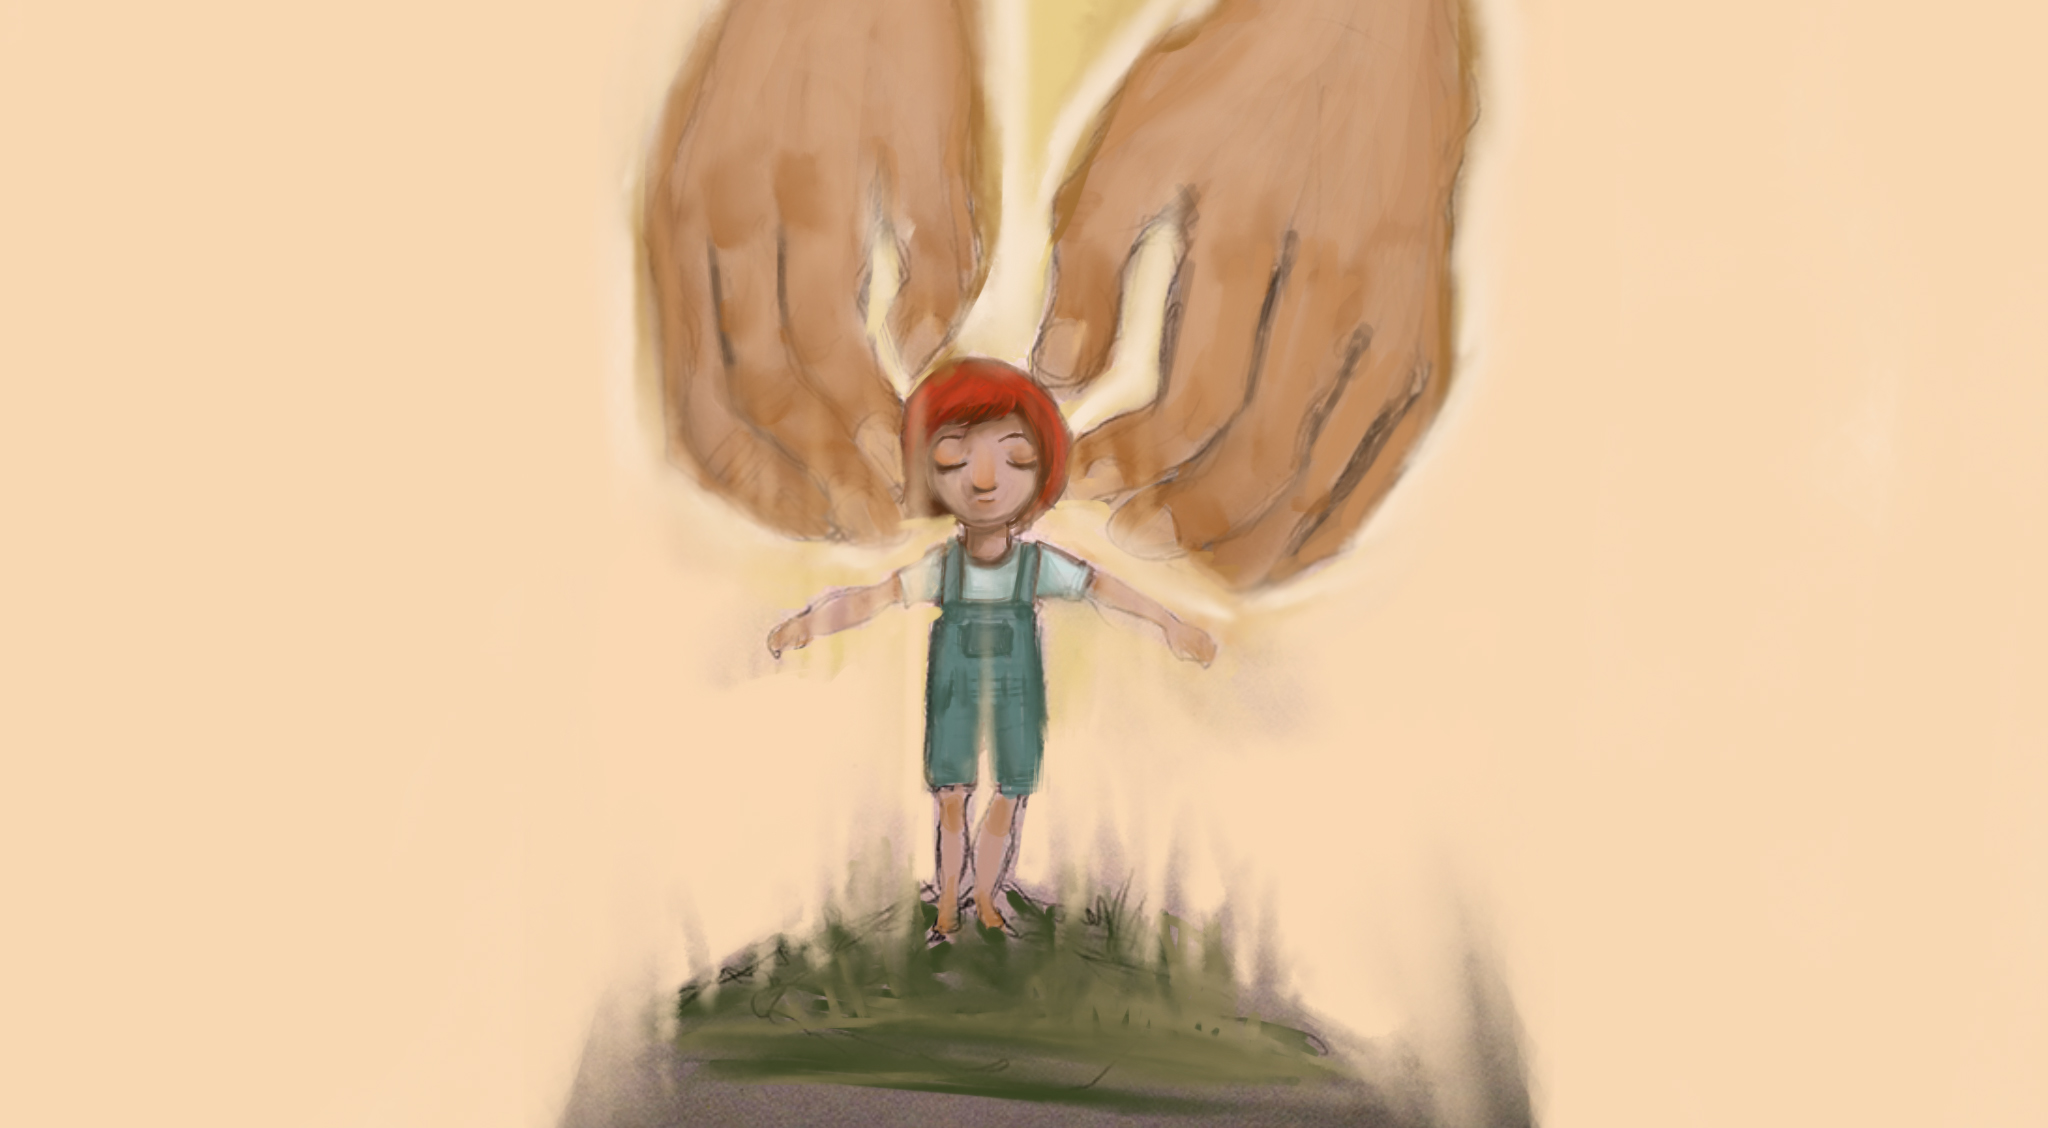 ywaw_god's_hands